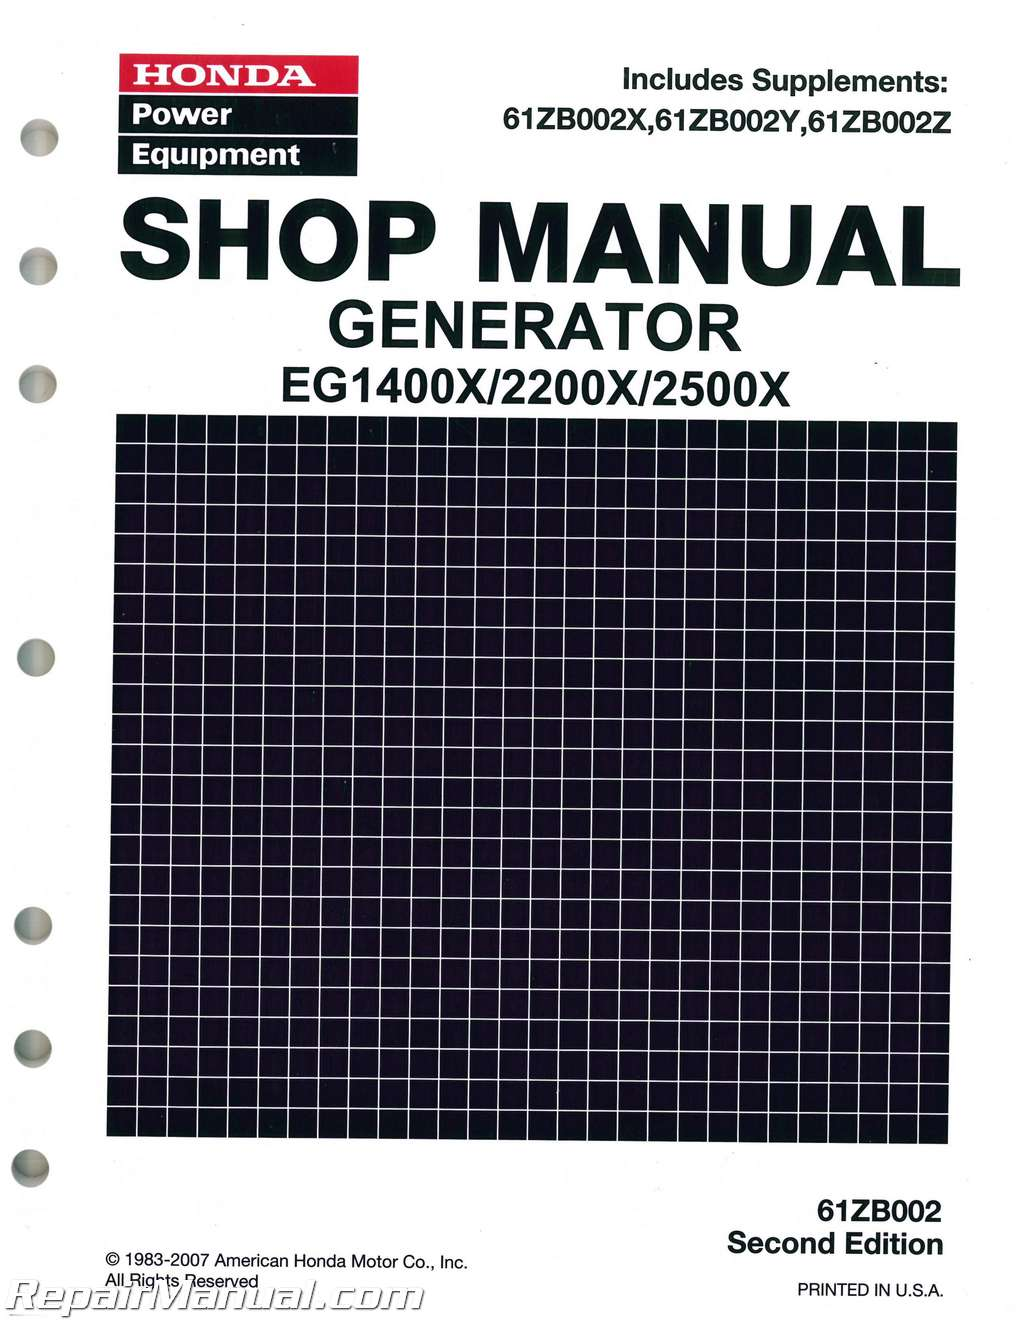 Honda EG1400X EG2200X And EG2500X Generator Shop Manual